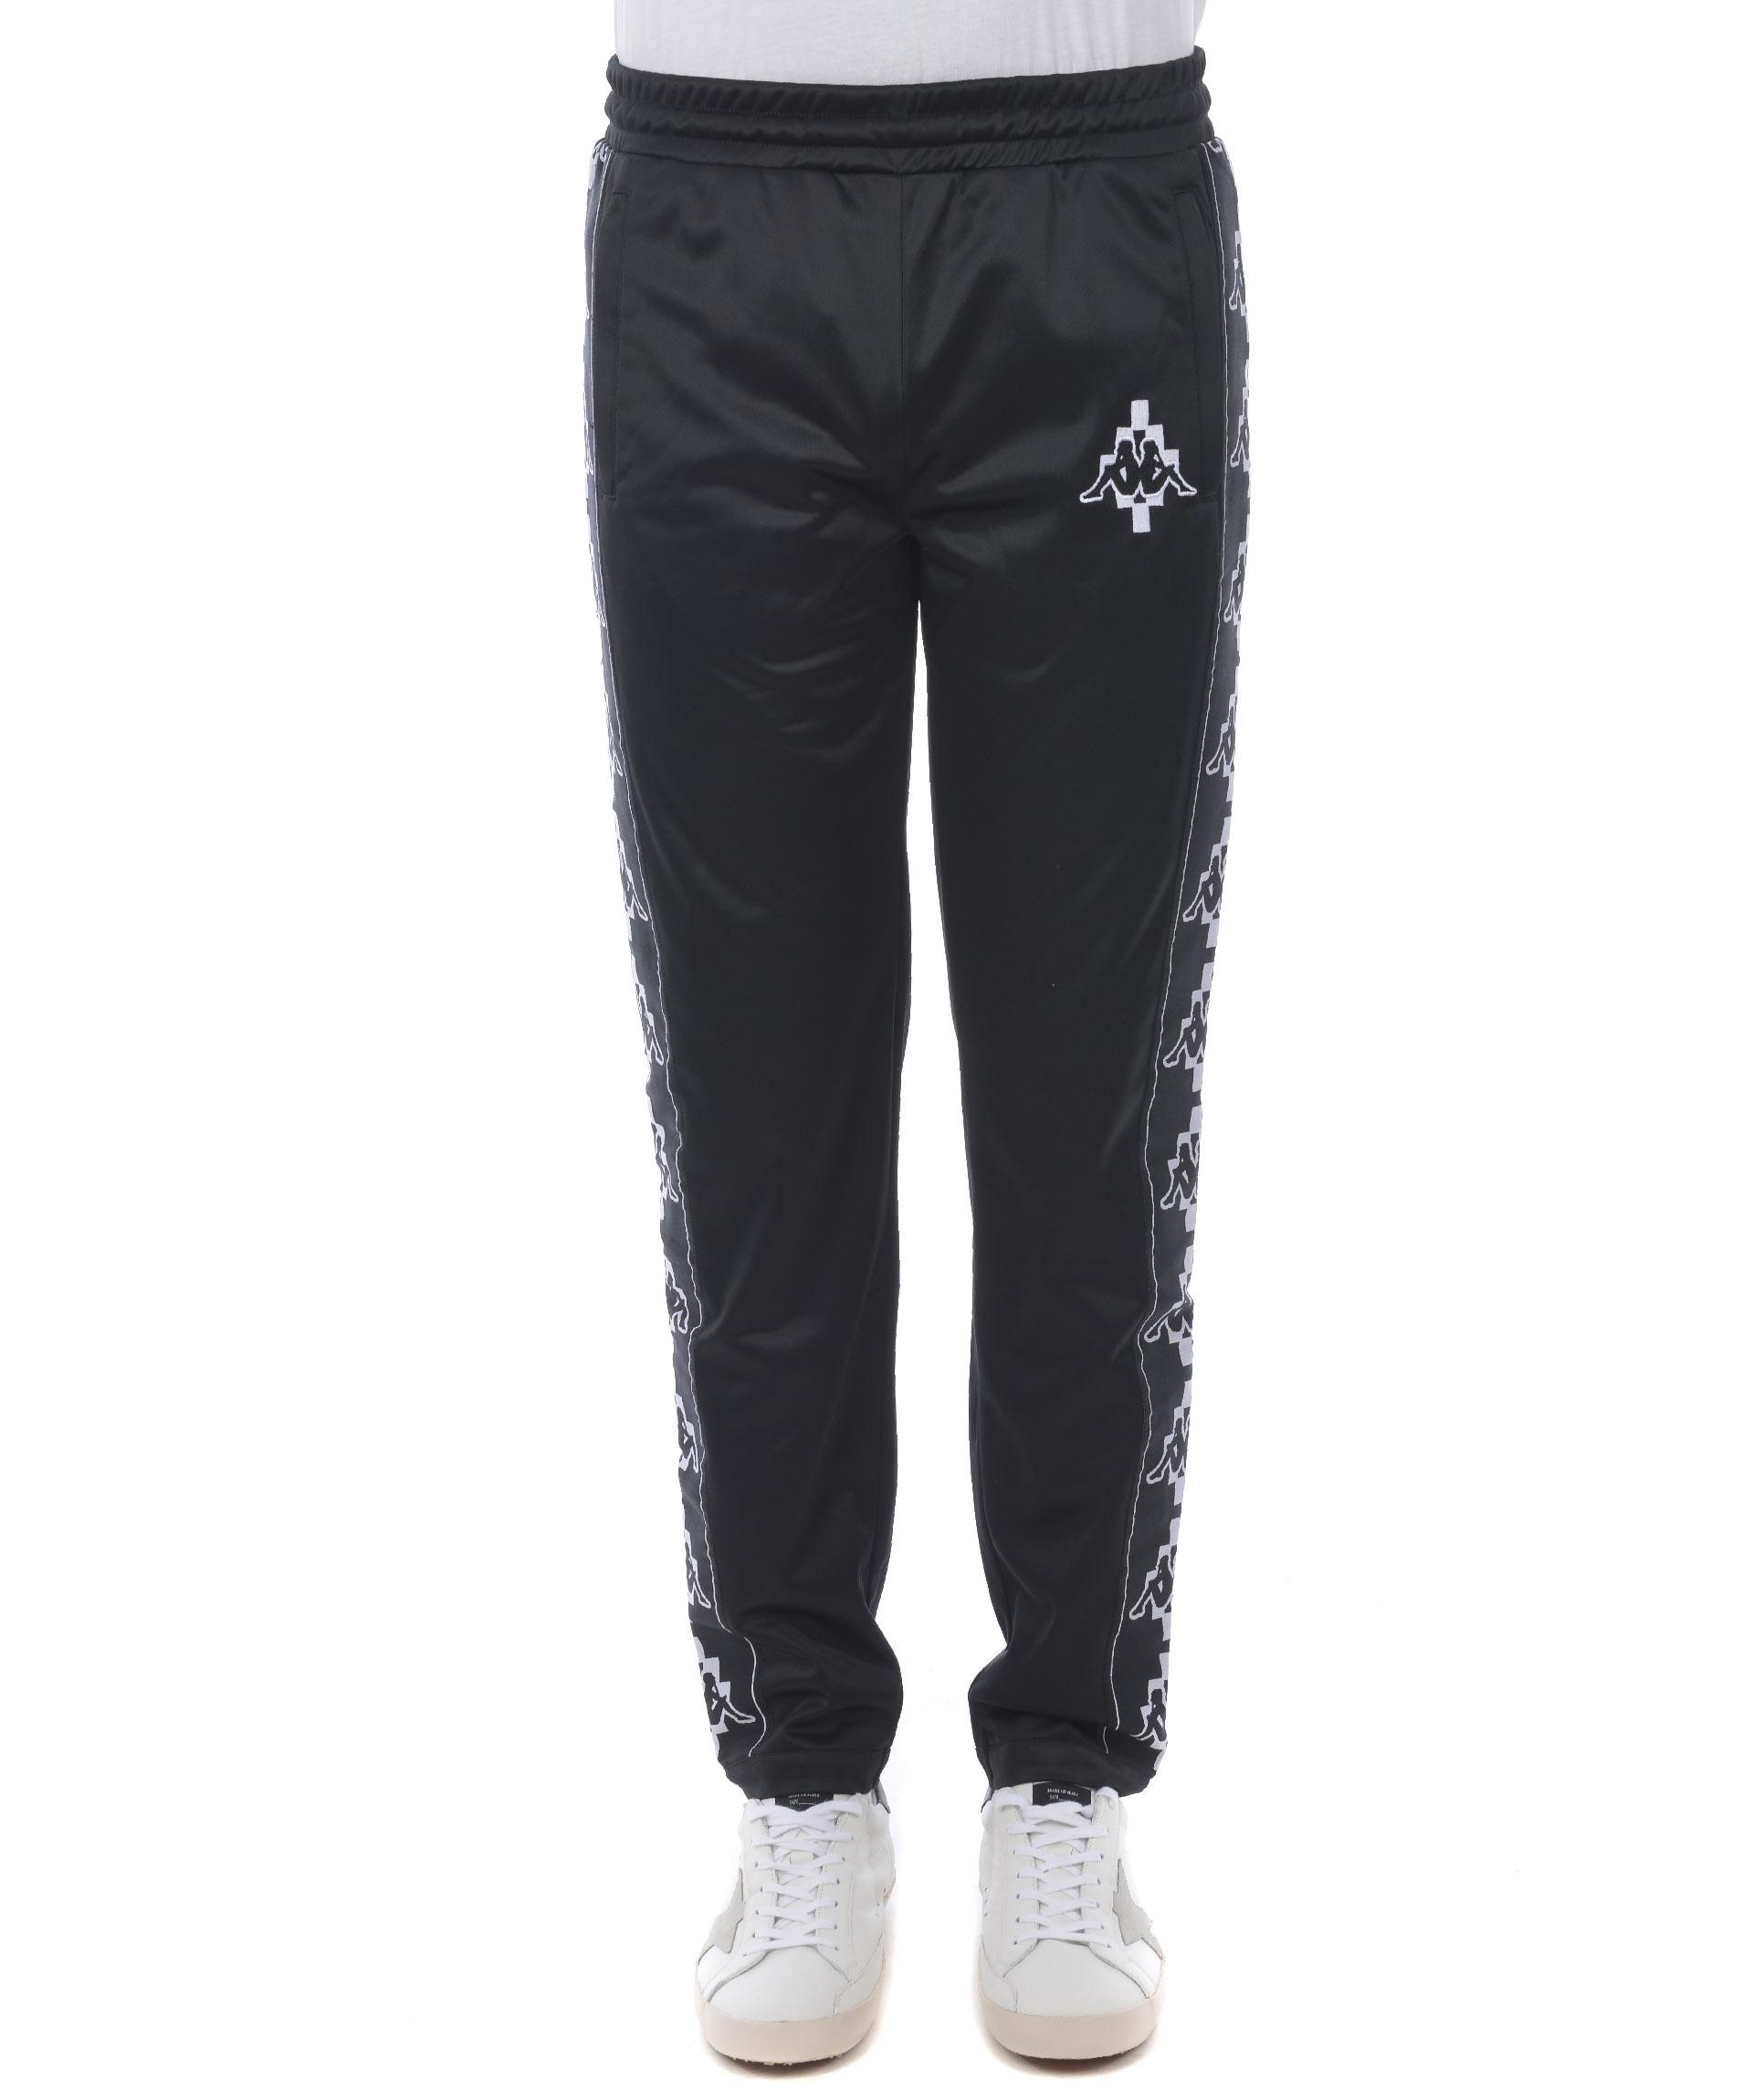 pantaloni jogging marcelo burlon x kappa kappa tape marcelo burlon tufanomoda. Black Bedroom Furniture Sets. Home Design Ideas